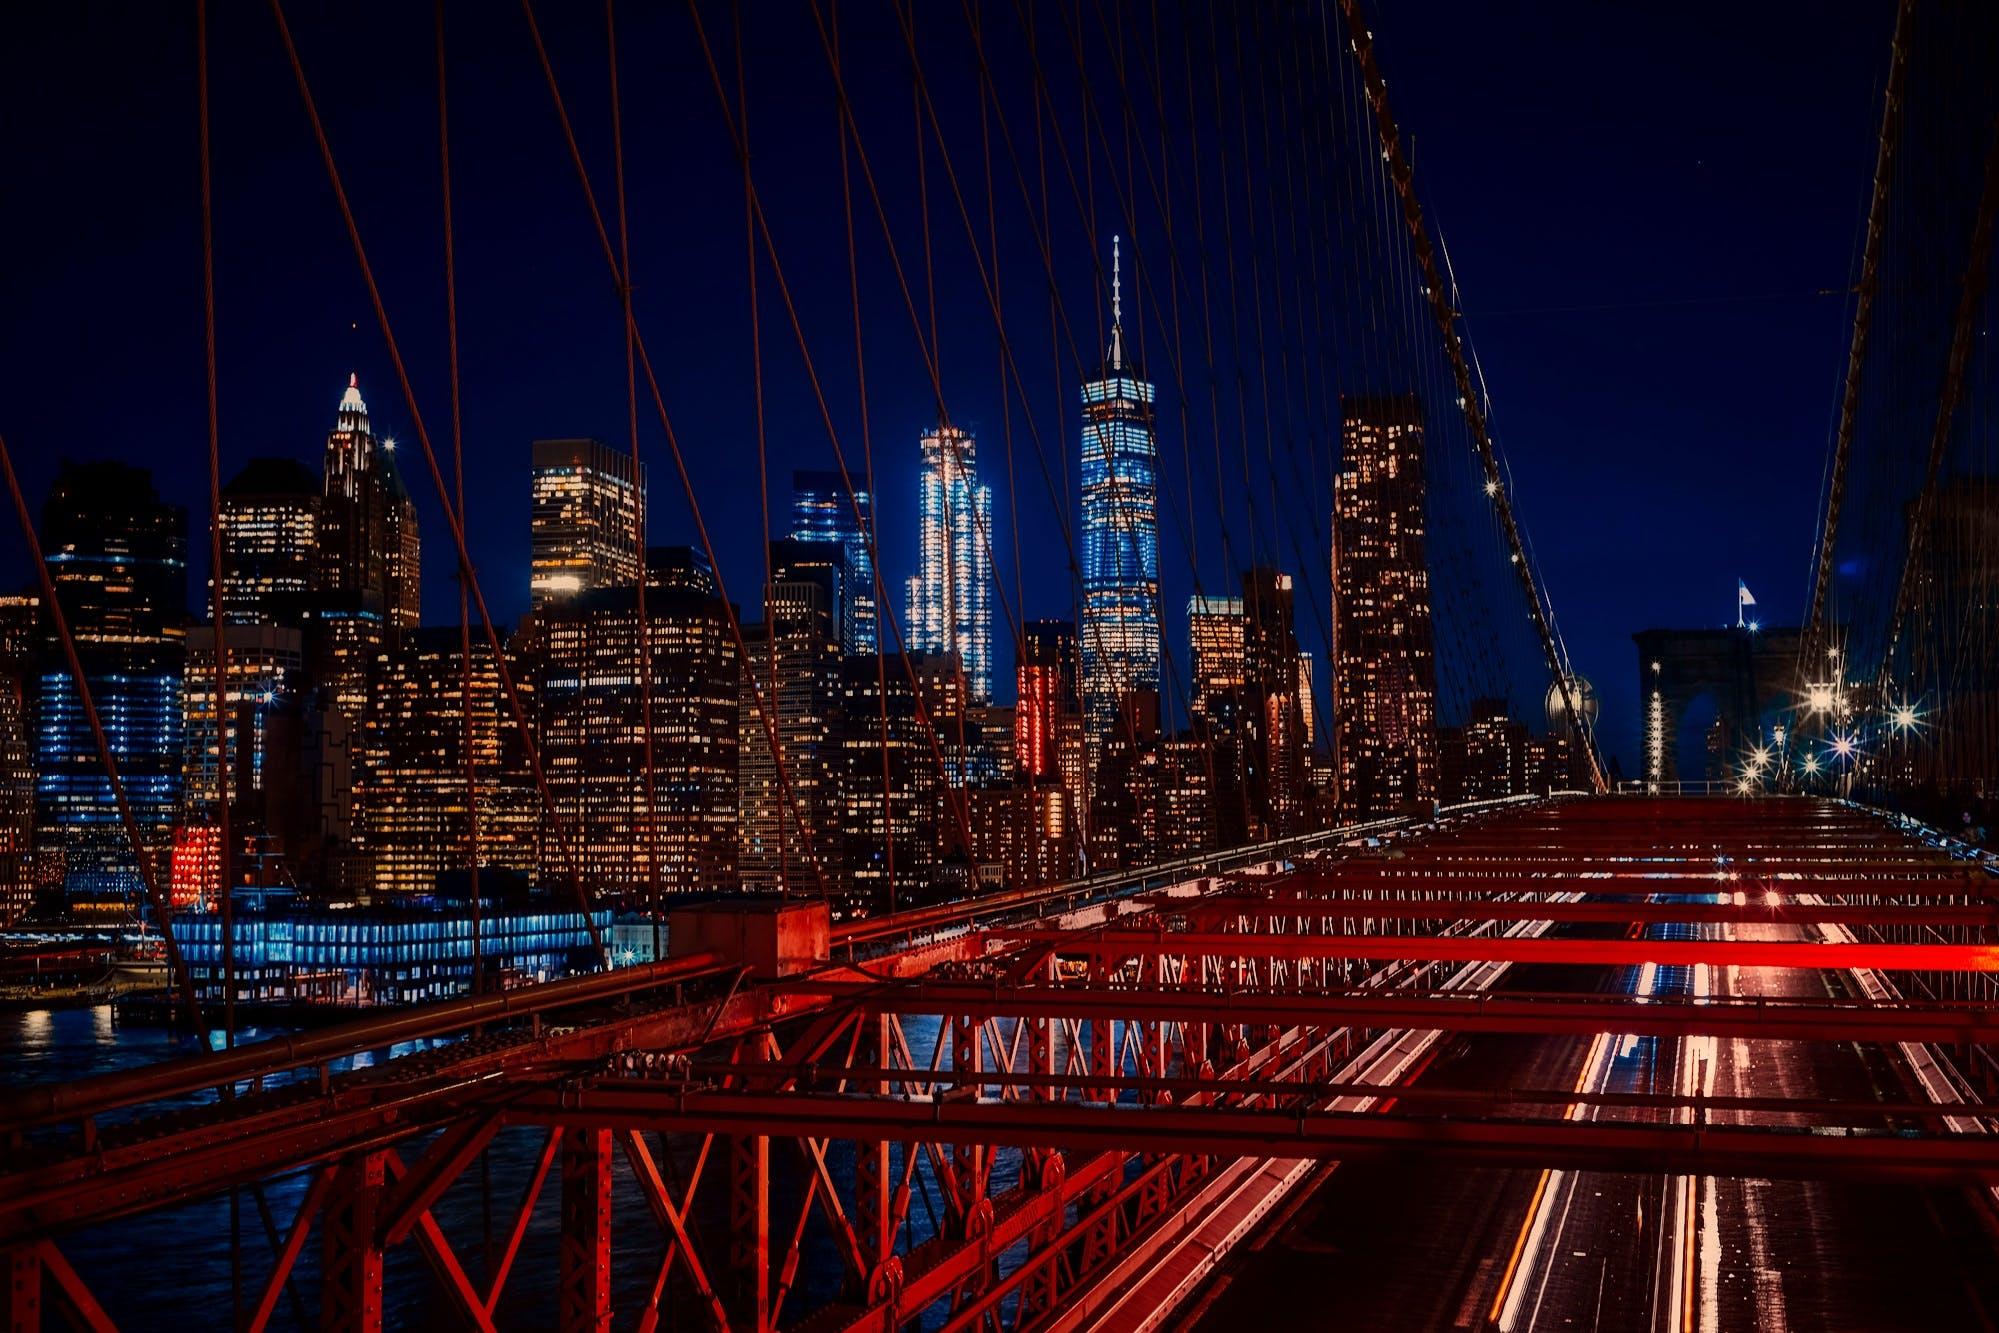 bridge, buildings, city lights